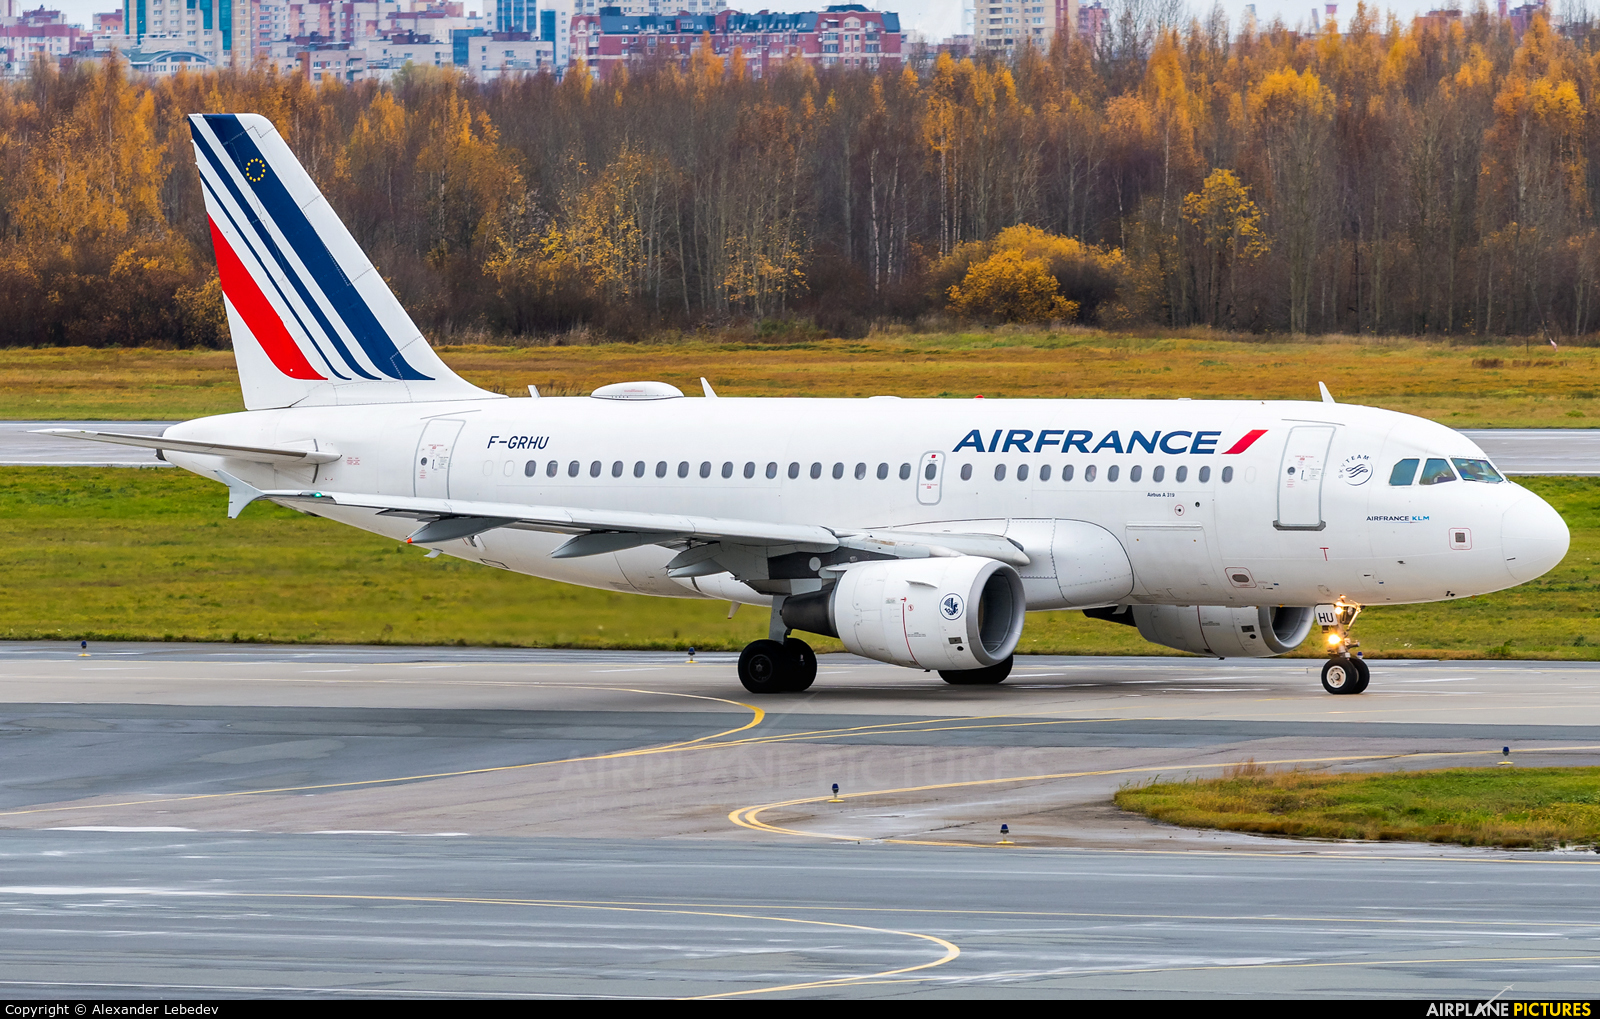 Air France F-GRHU aircraft at St. Petersburg - Pulkovo